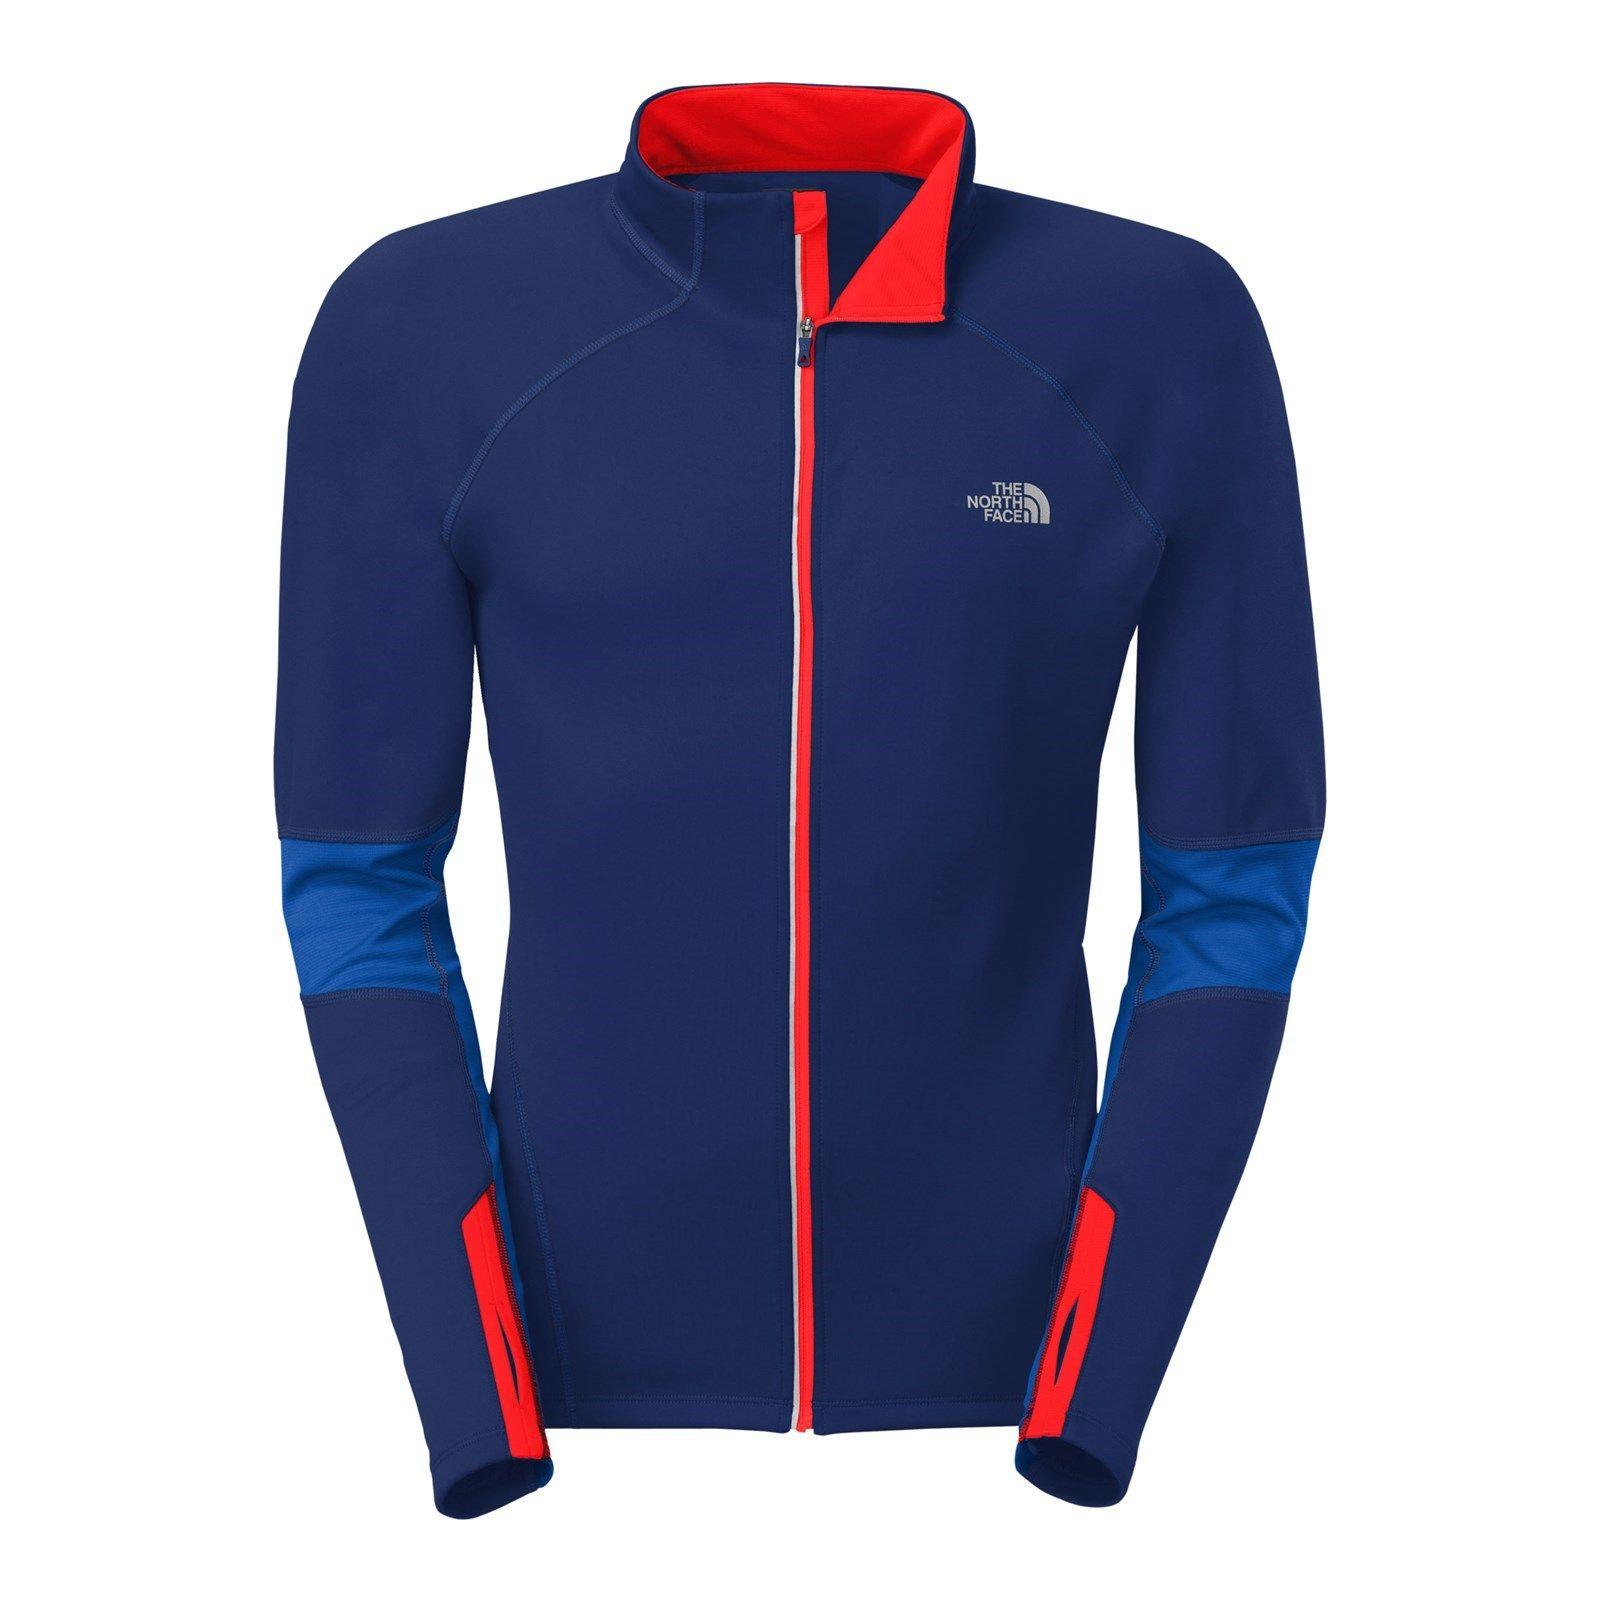 75ef7c349 The North Face Men's Momentum Thermal Full Zip | Men's Fitness Gear ...